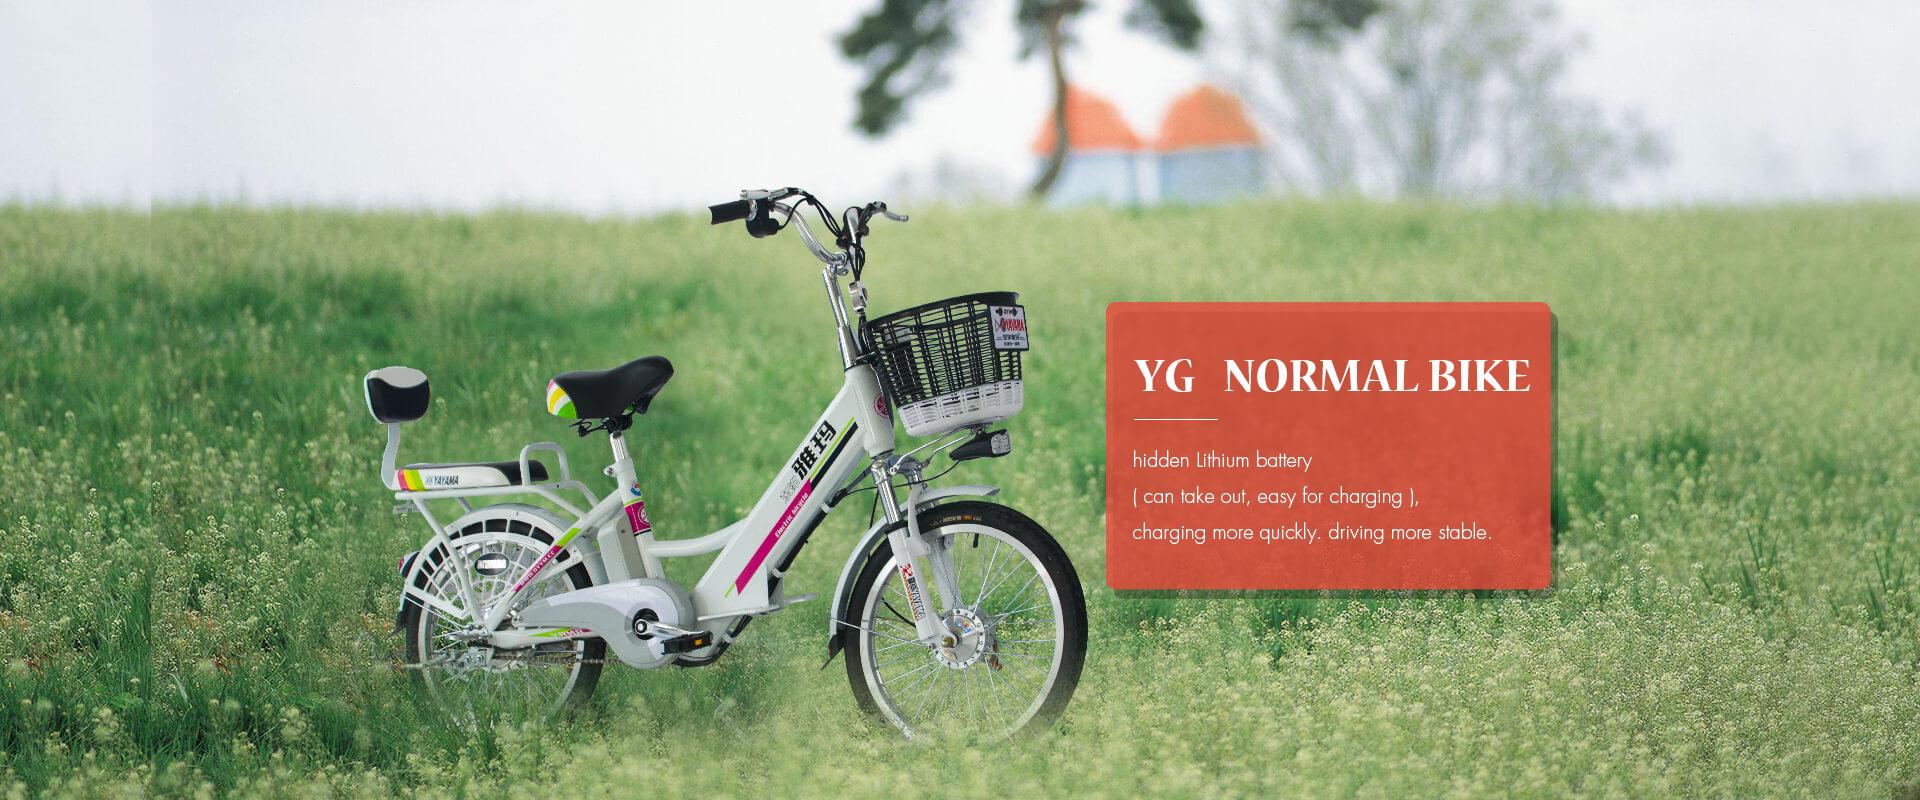 YG Normal Bicycle